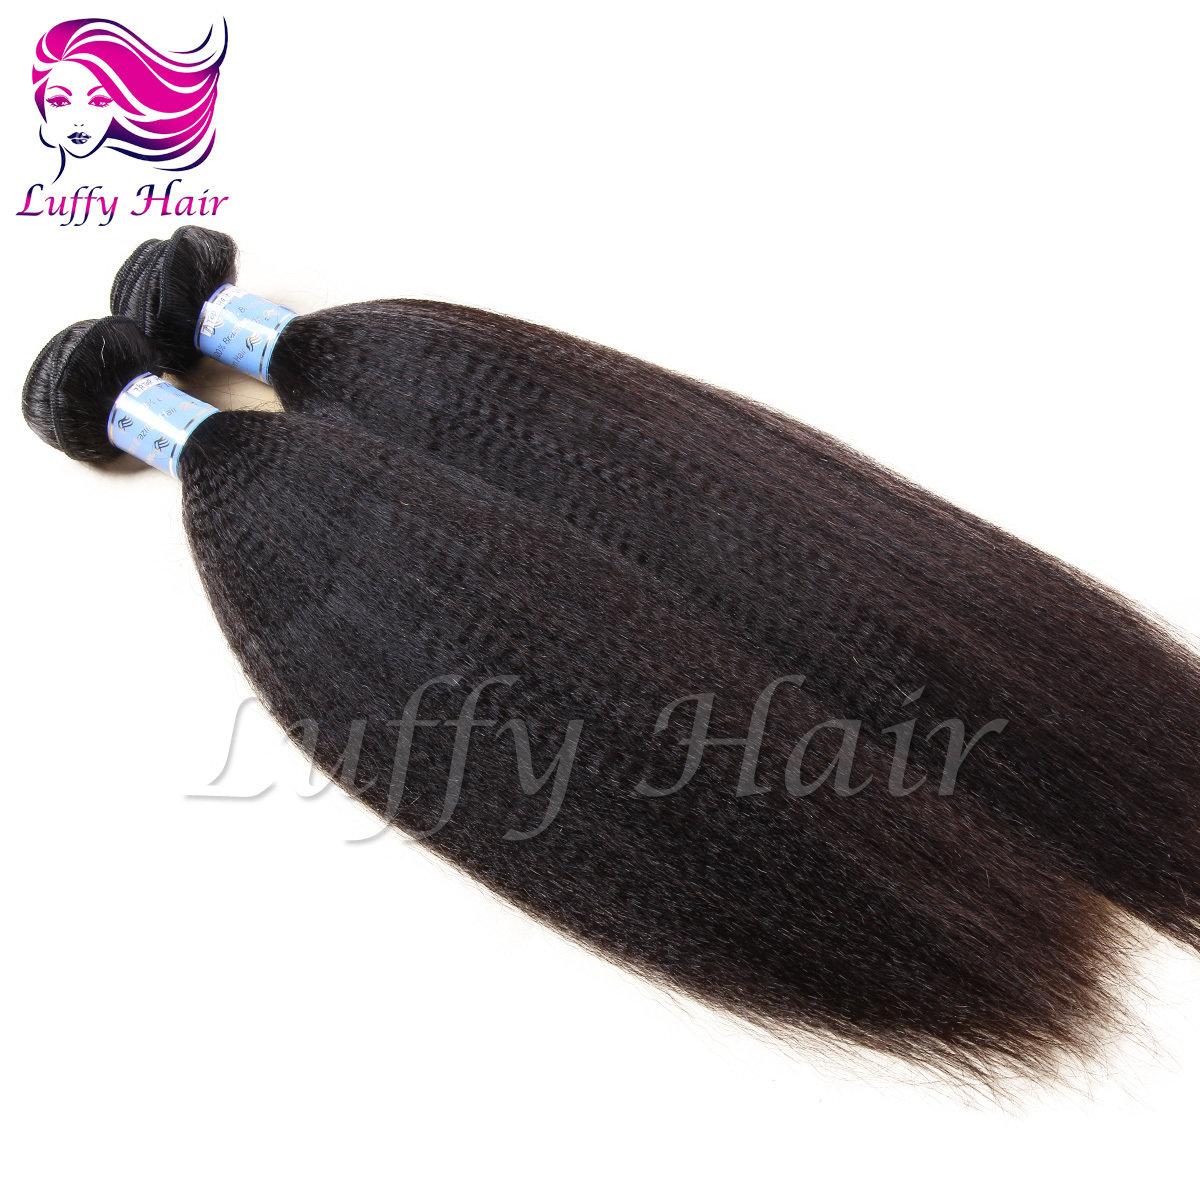 8A Virgin Human Hair Italian Light Yaki Straight Hair Bundle - KEL012